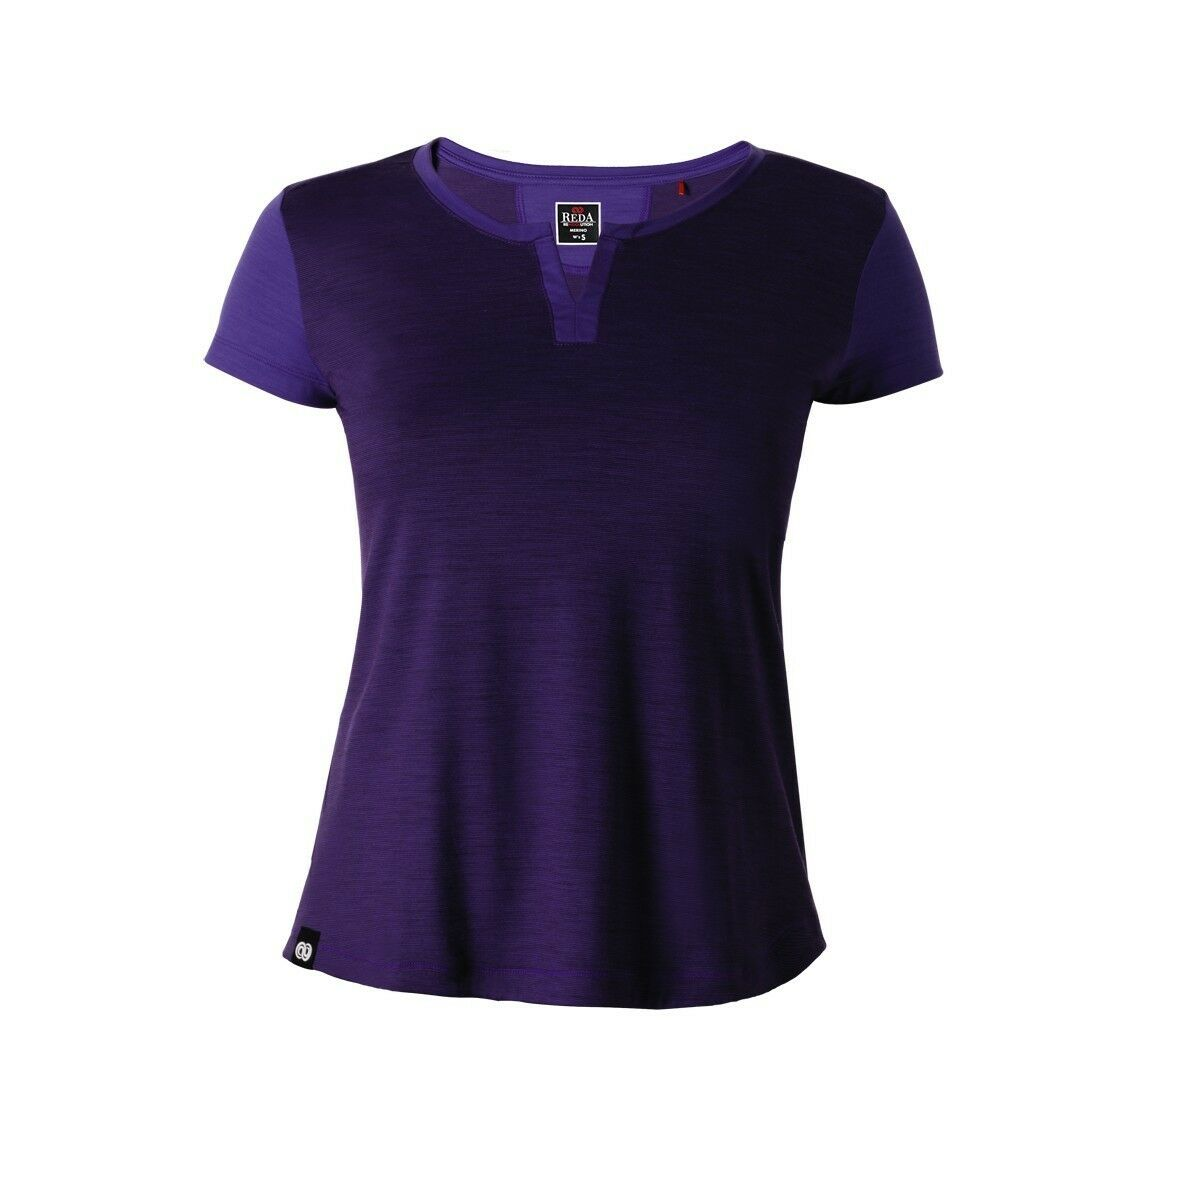 Reda Rewoolution Victoria, pour Femme Tee-Shirt Manches Courtes 140,